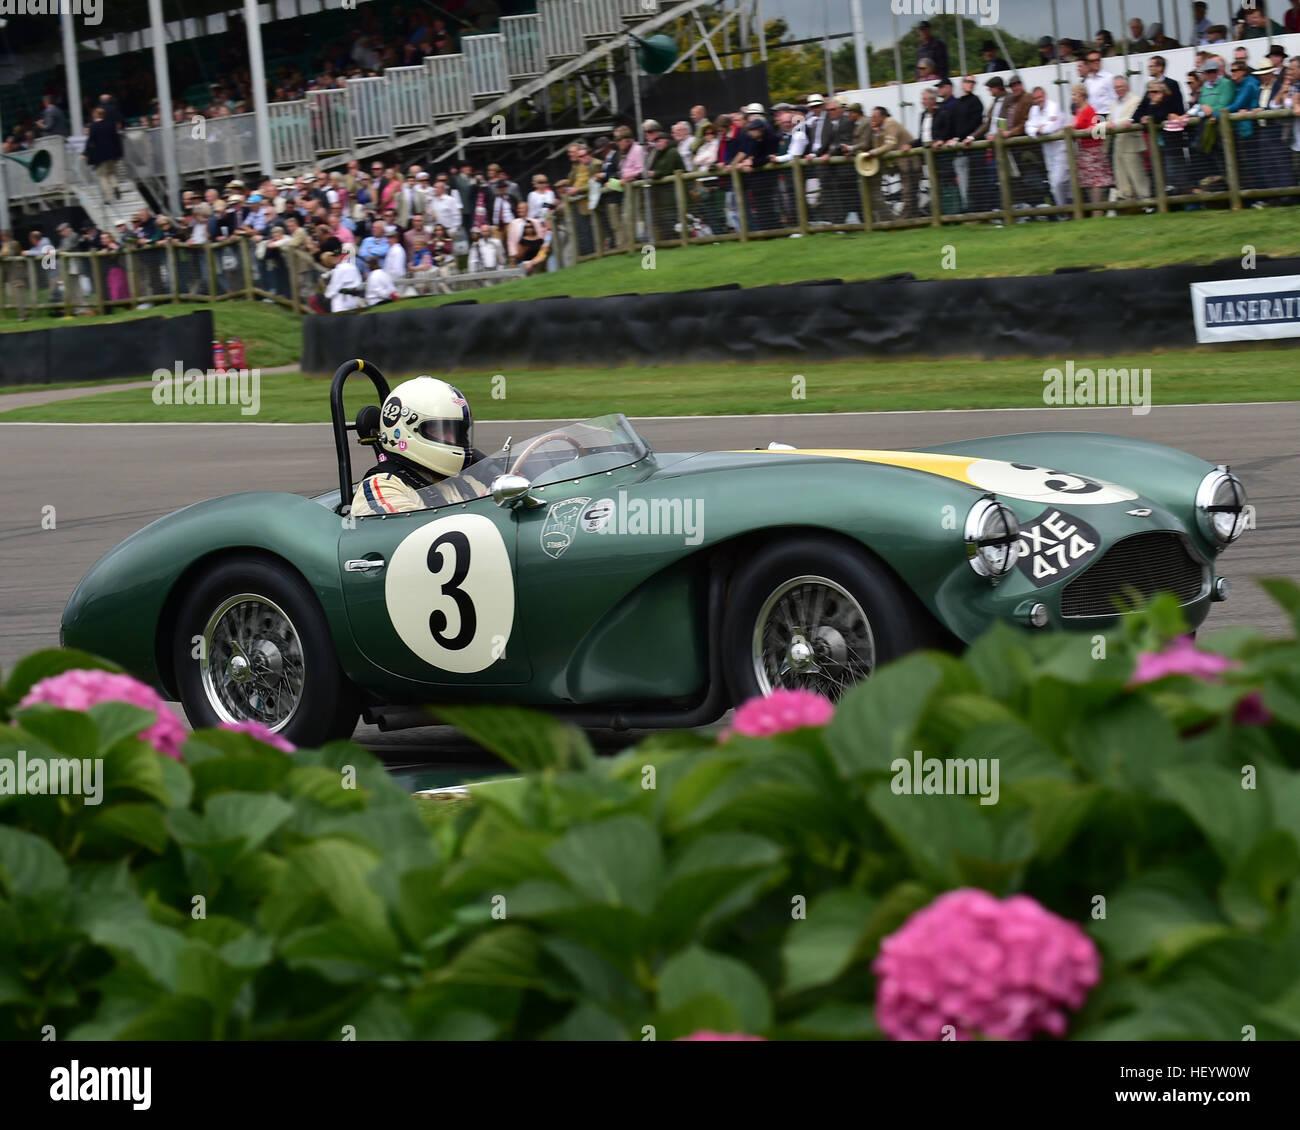 Aston Martin DB3S, Freddie März Memorial Trophy, Sports Racing Cars, Steve Boutlbee Brooks, Goodwood Revival Stockbild